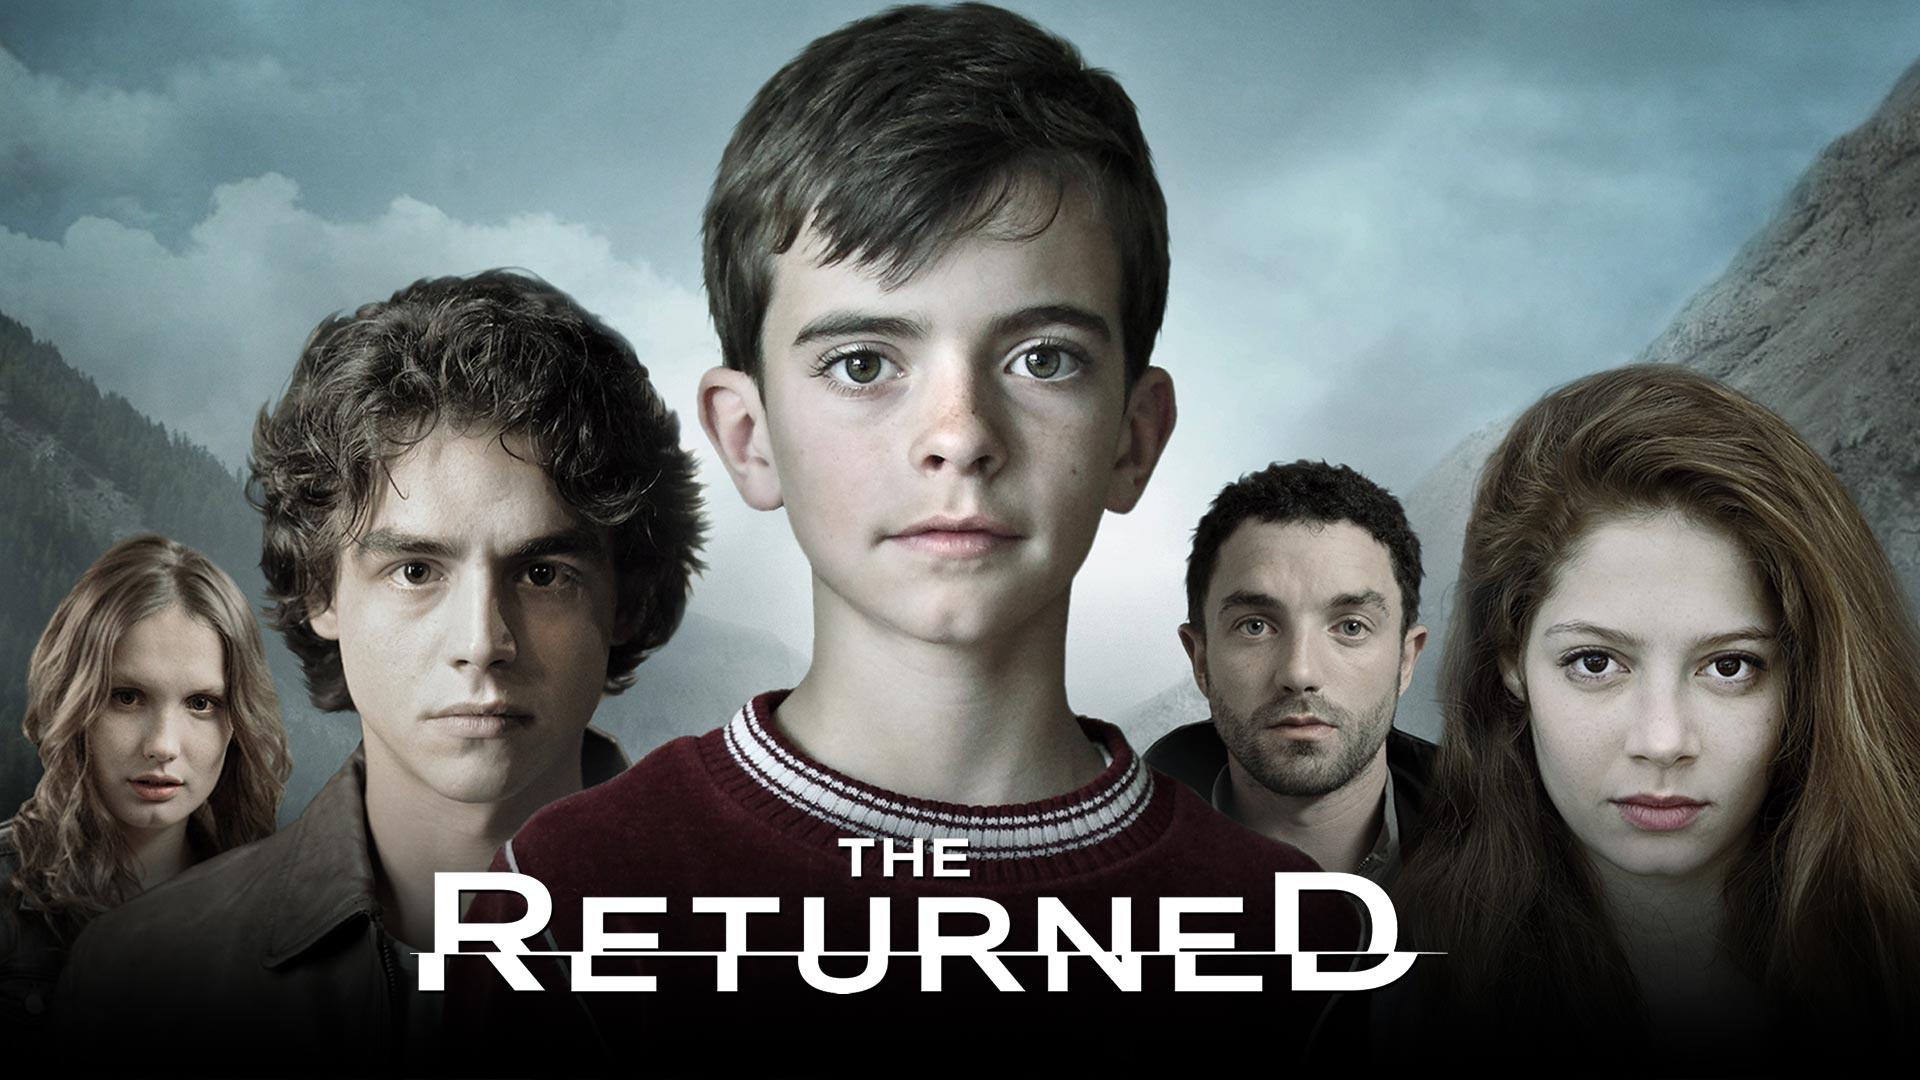 The Returned Season 1 (English Subtitled)